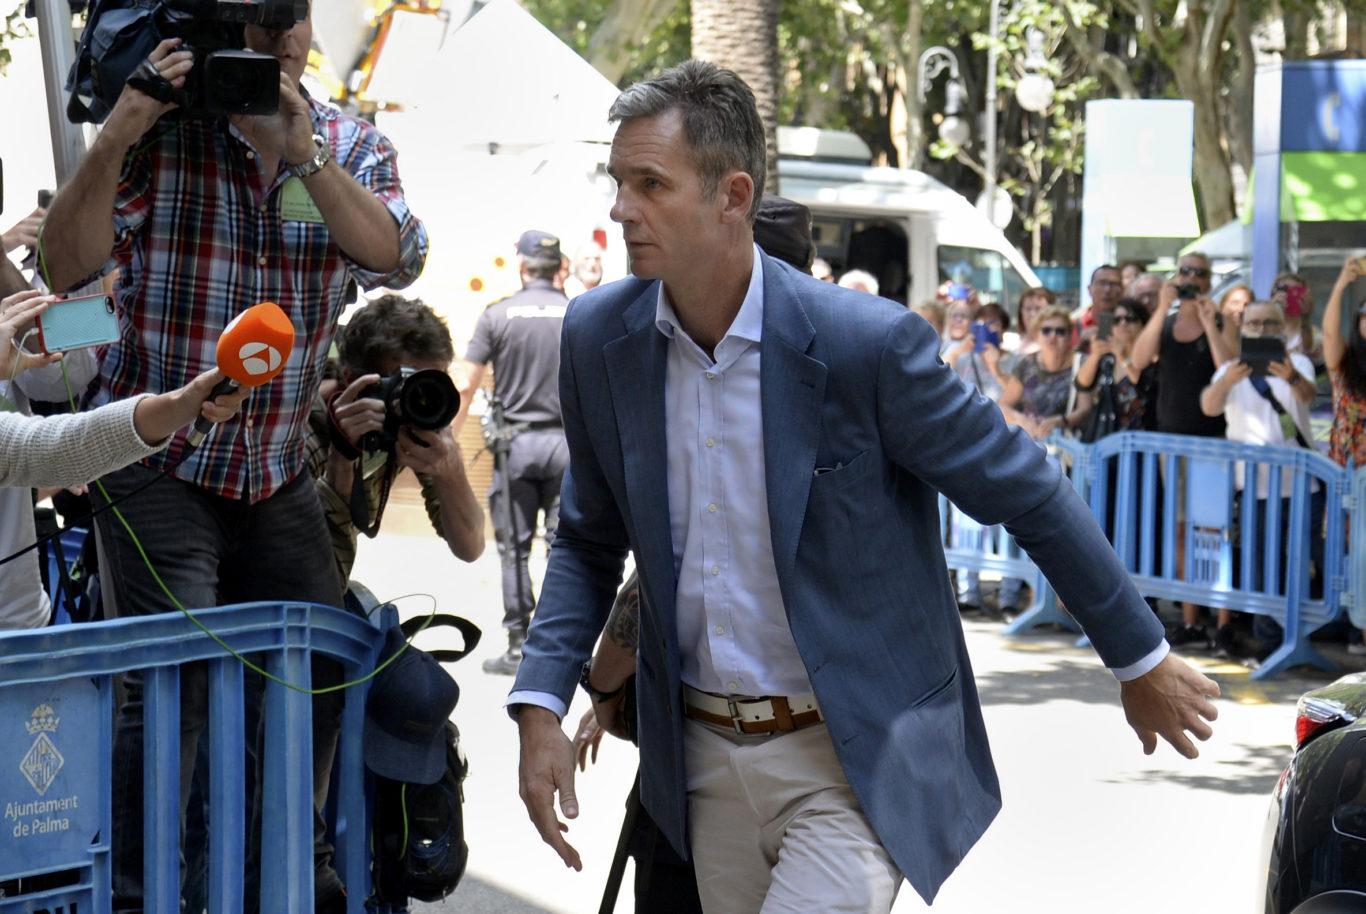 Spanish court upholds prison sentence for princess's husband